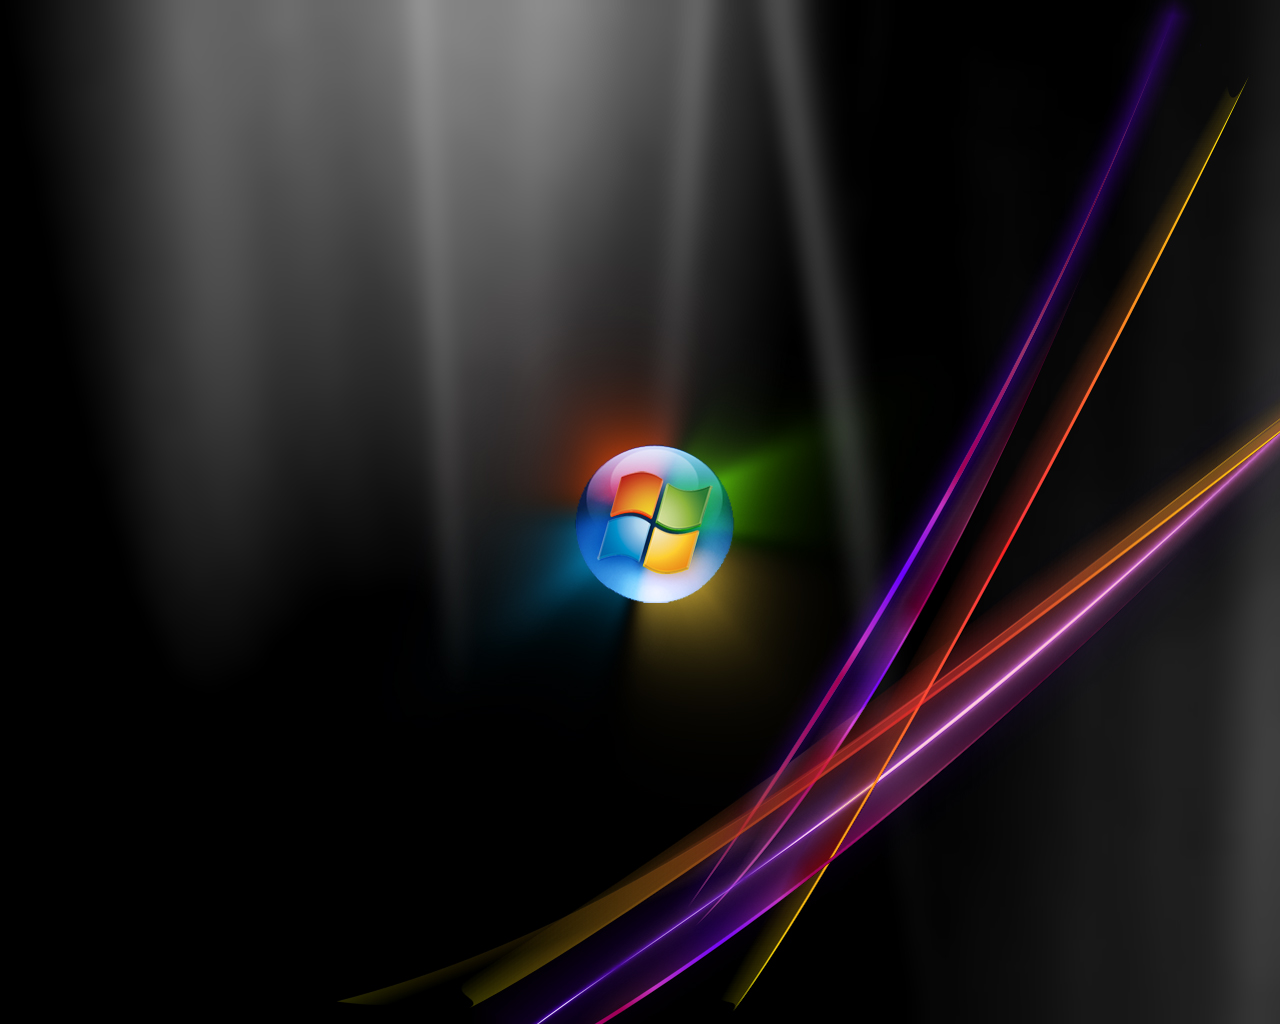 My Desktop image Windows_Vista__003865_